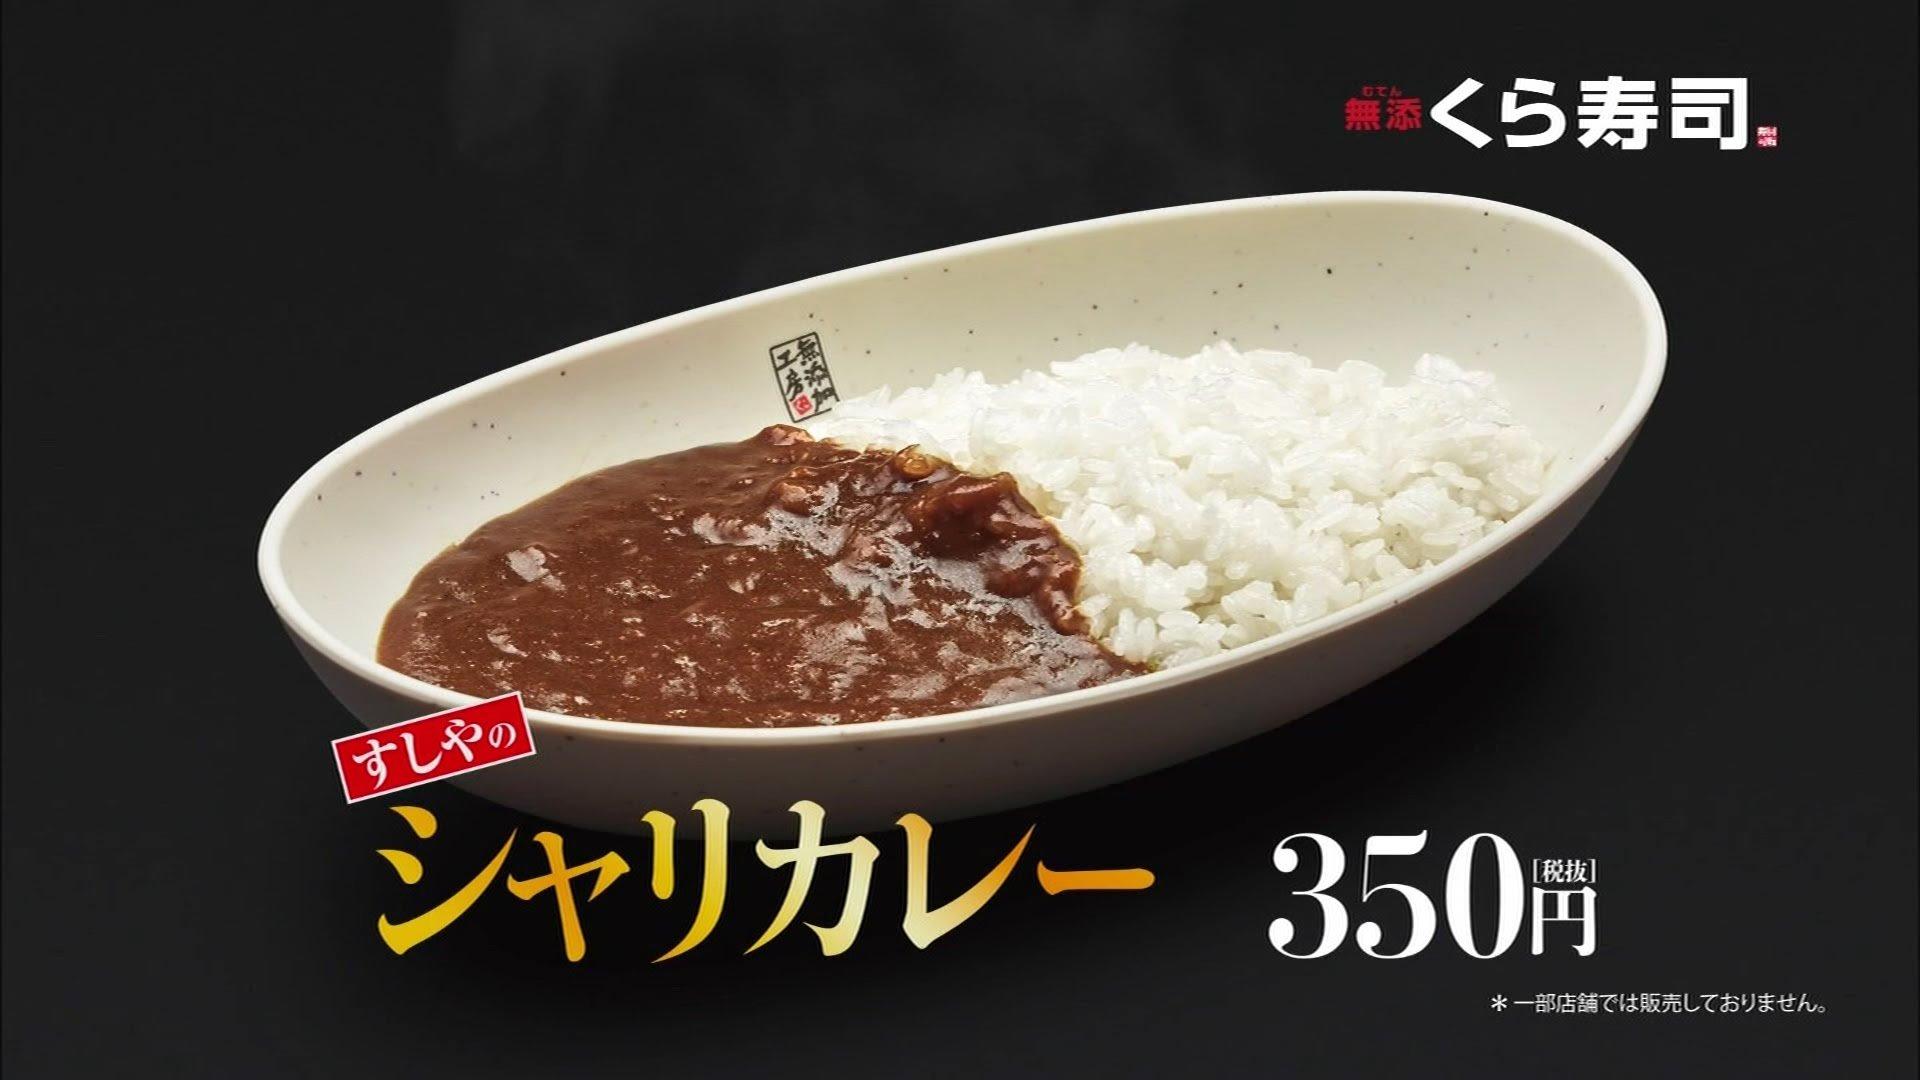 Image result for 回転寿司 くら シャリカレー